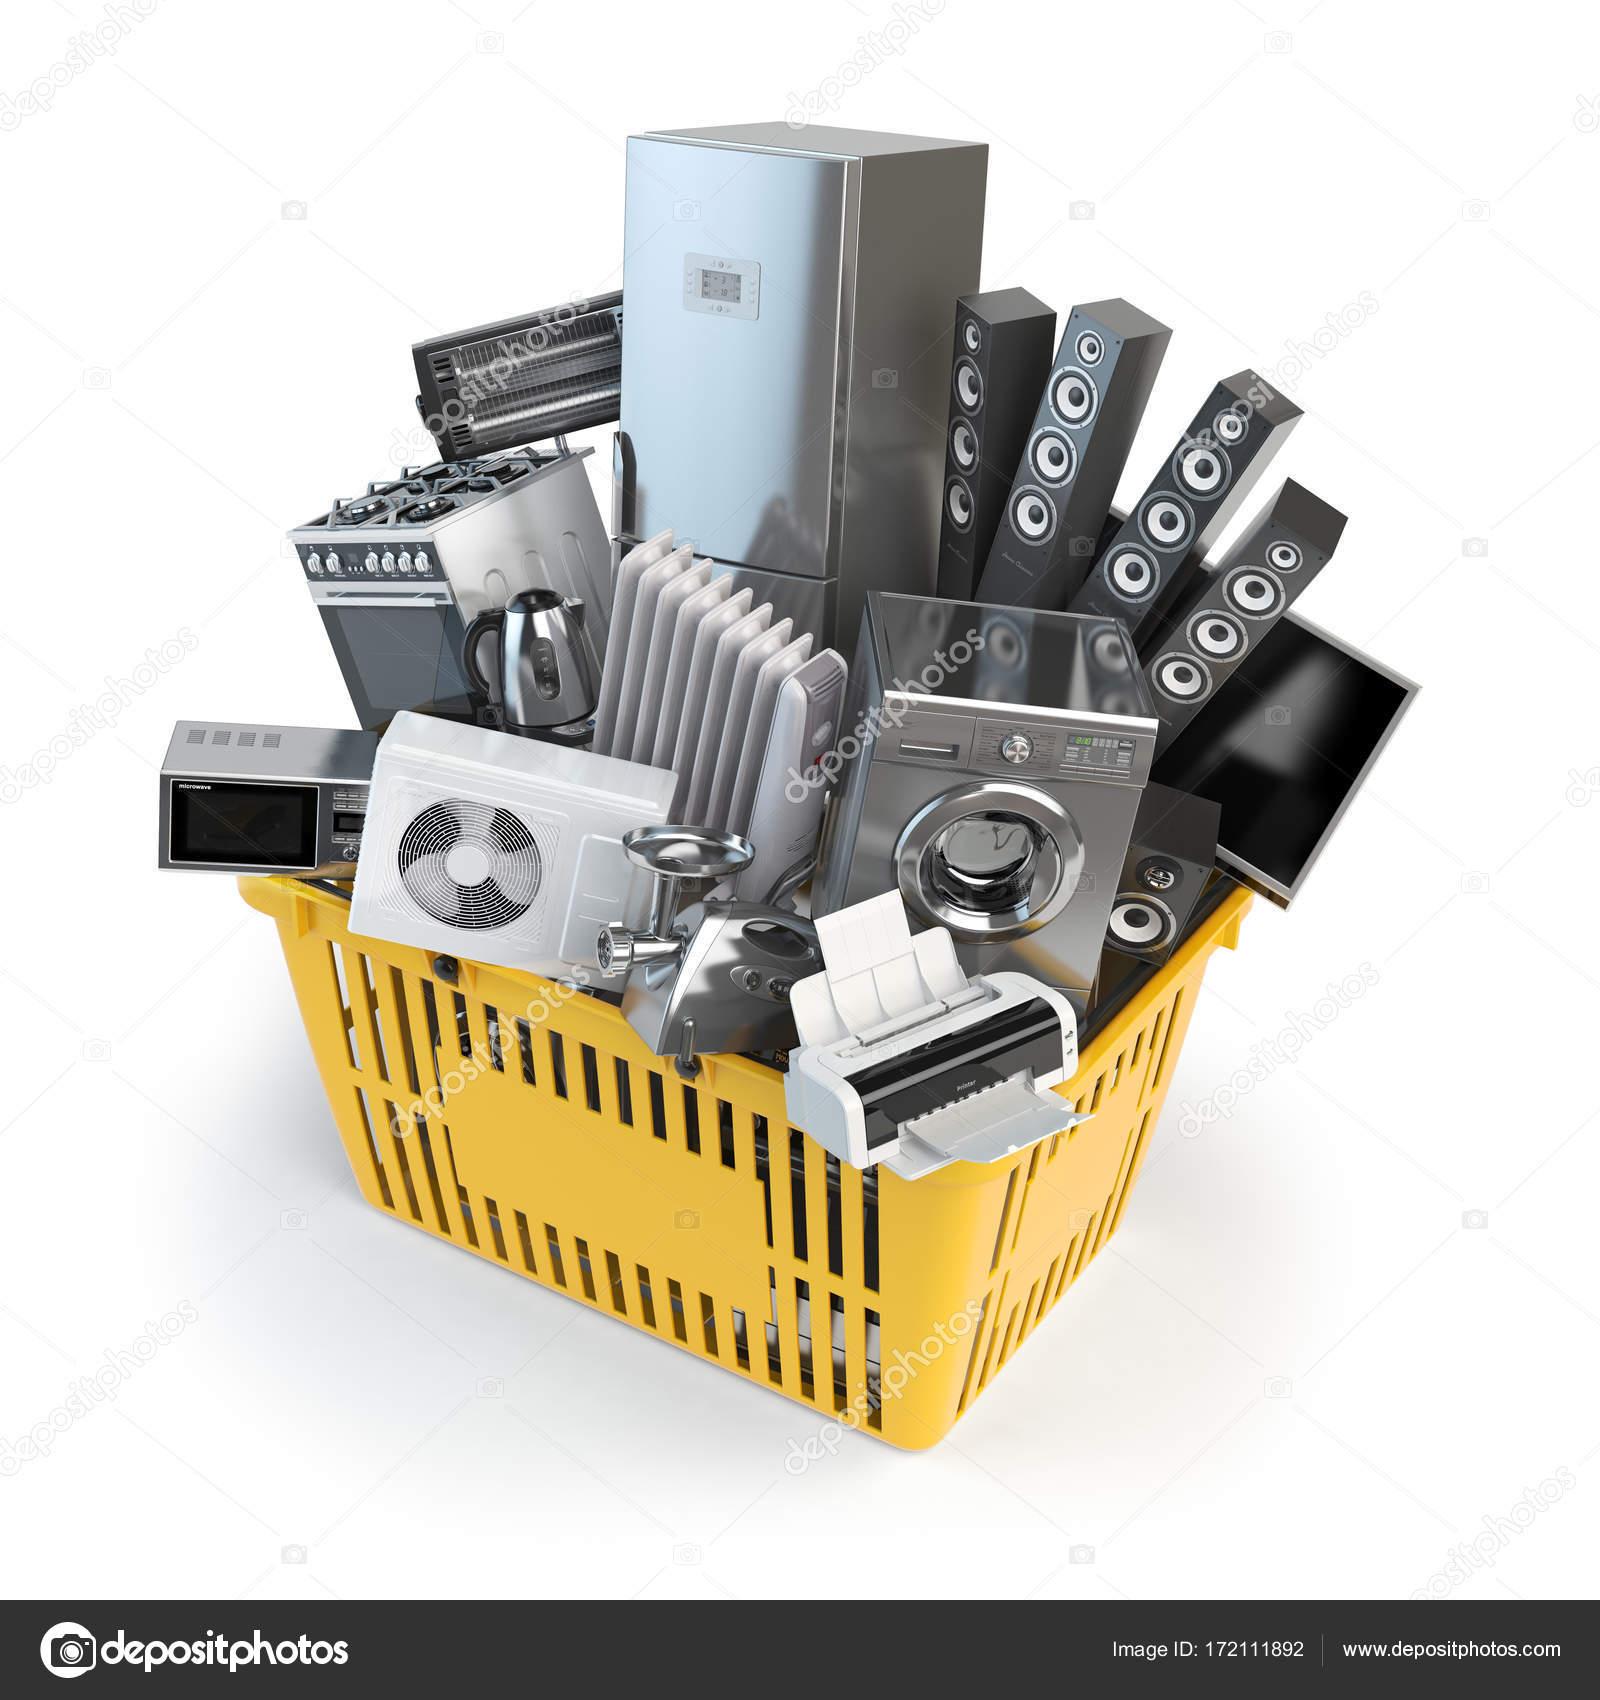 Kitchen Appliances In The Shopping Basket Online E Commerce Concept Stock Photo C Maxxyustas 172111892